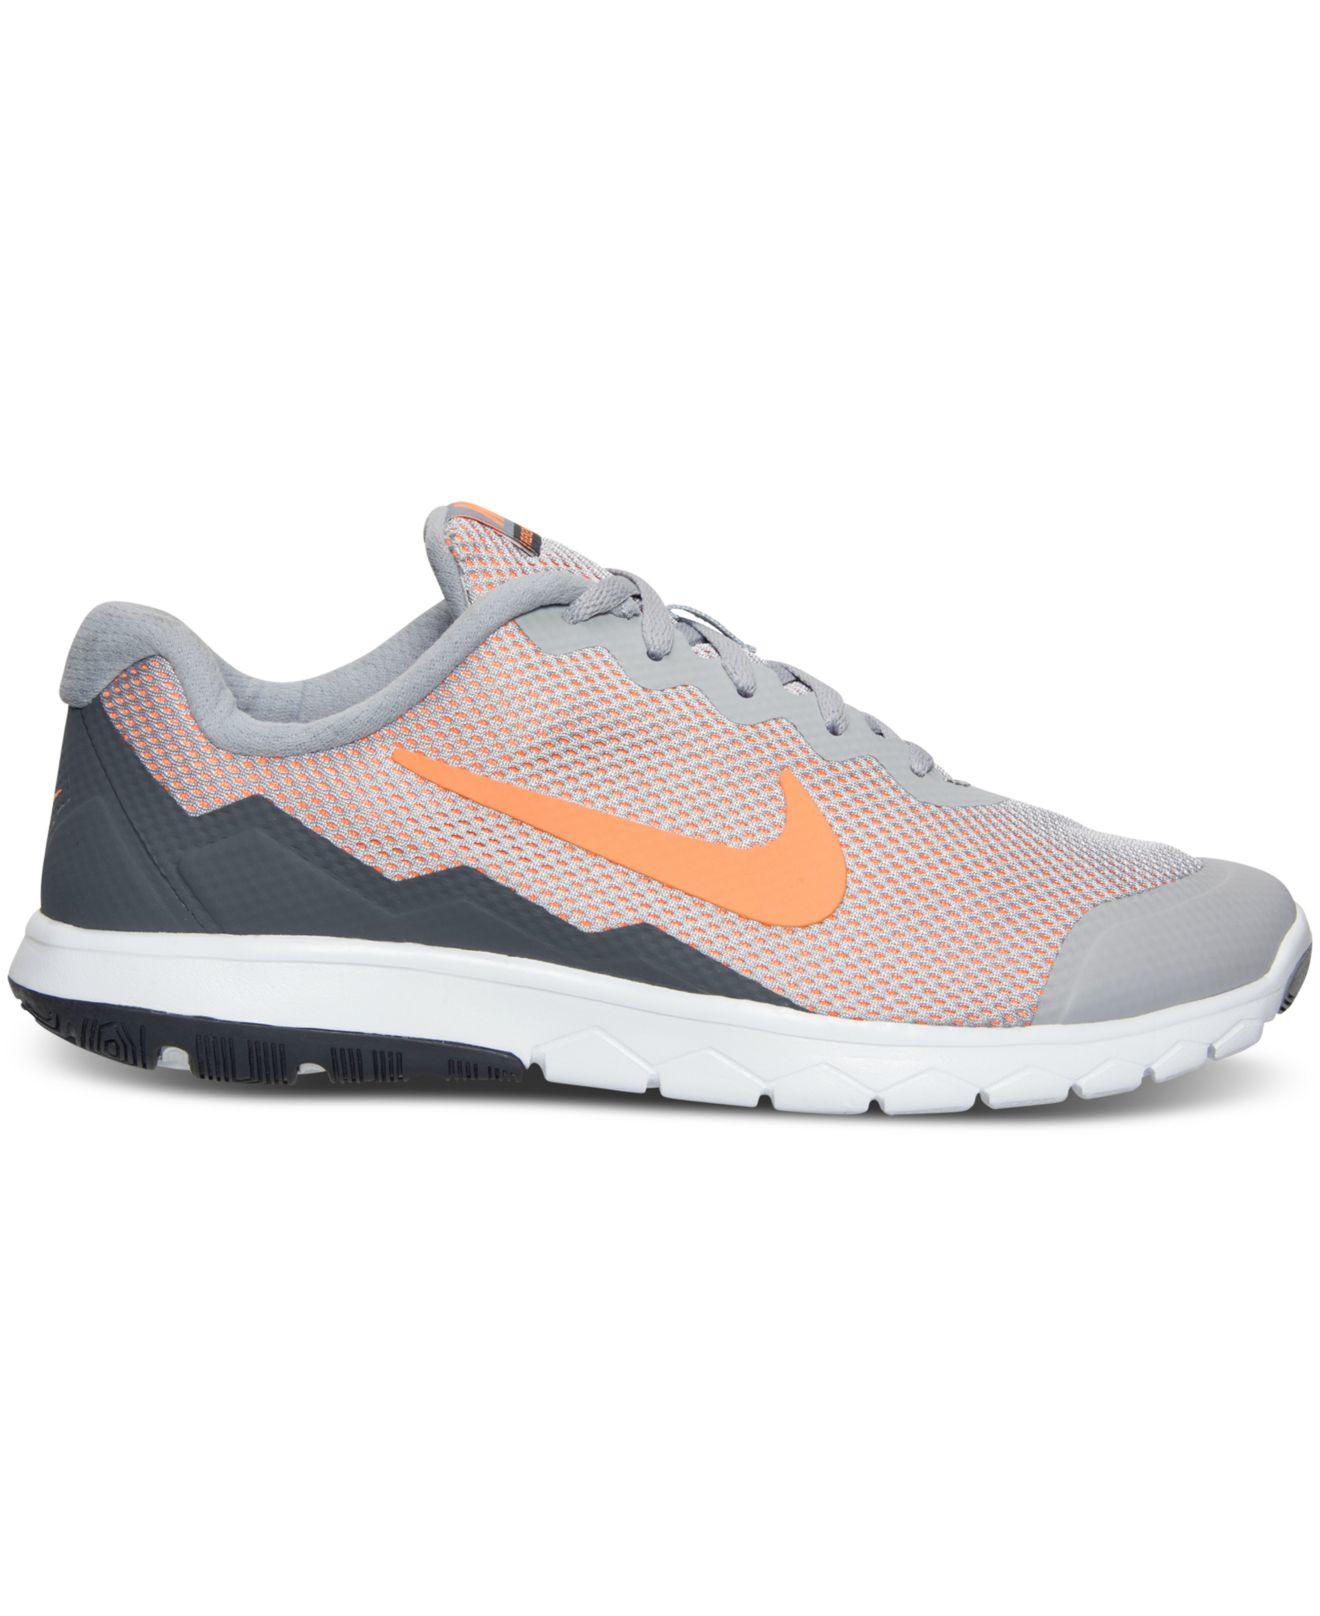 ee1cc7a5554218 ... shop nike wide width shoes nike mens wide shoes mens wide width  basketball shoes nike mens